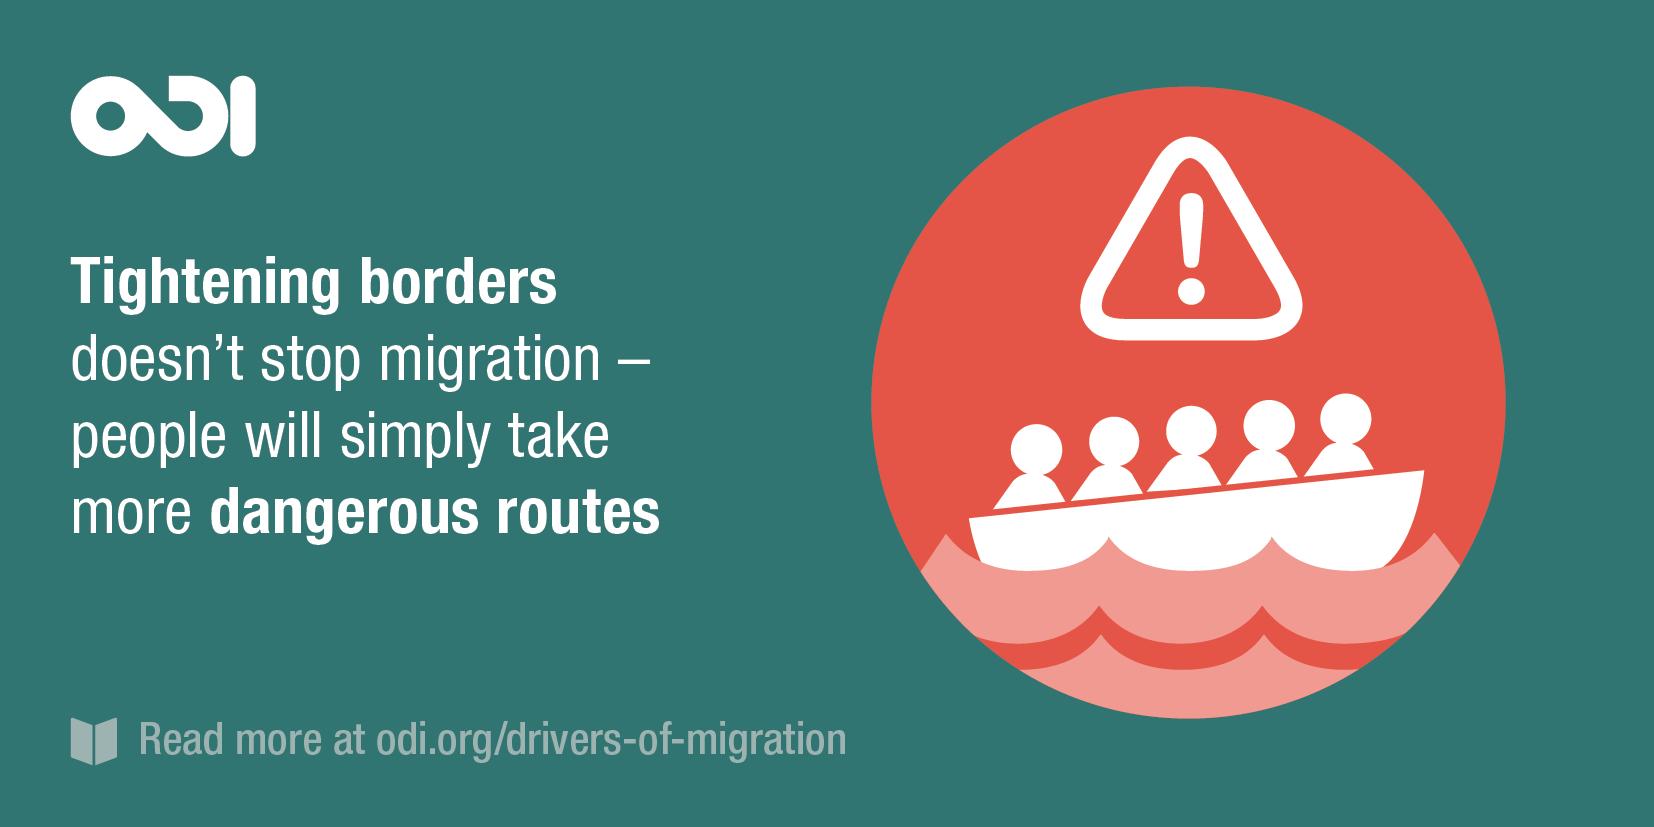 Illustration: tightening borders doesn't stop migration